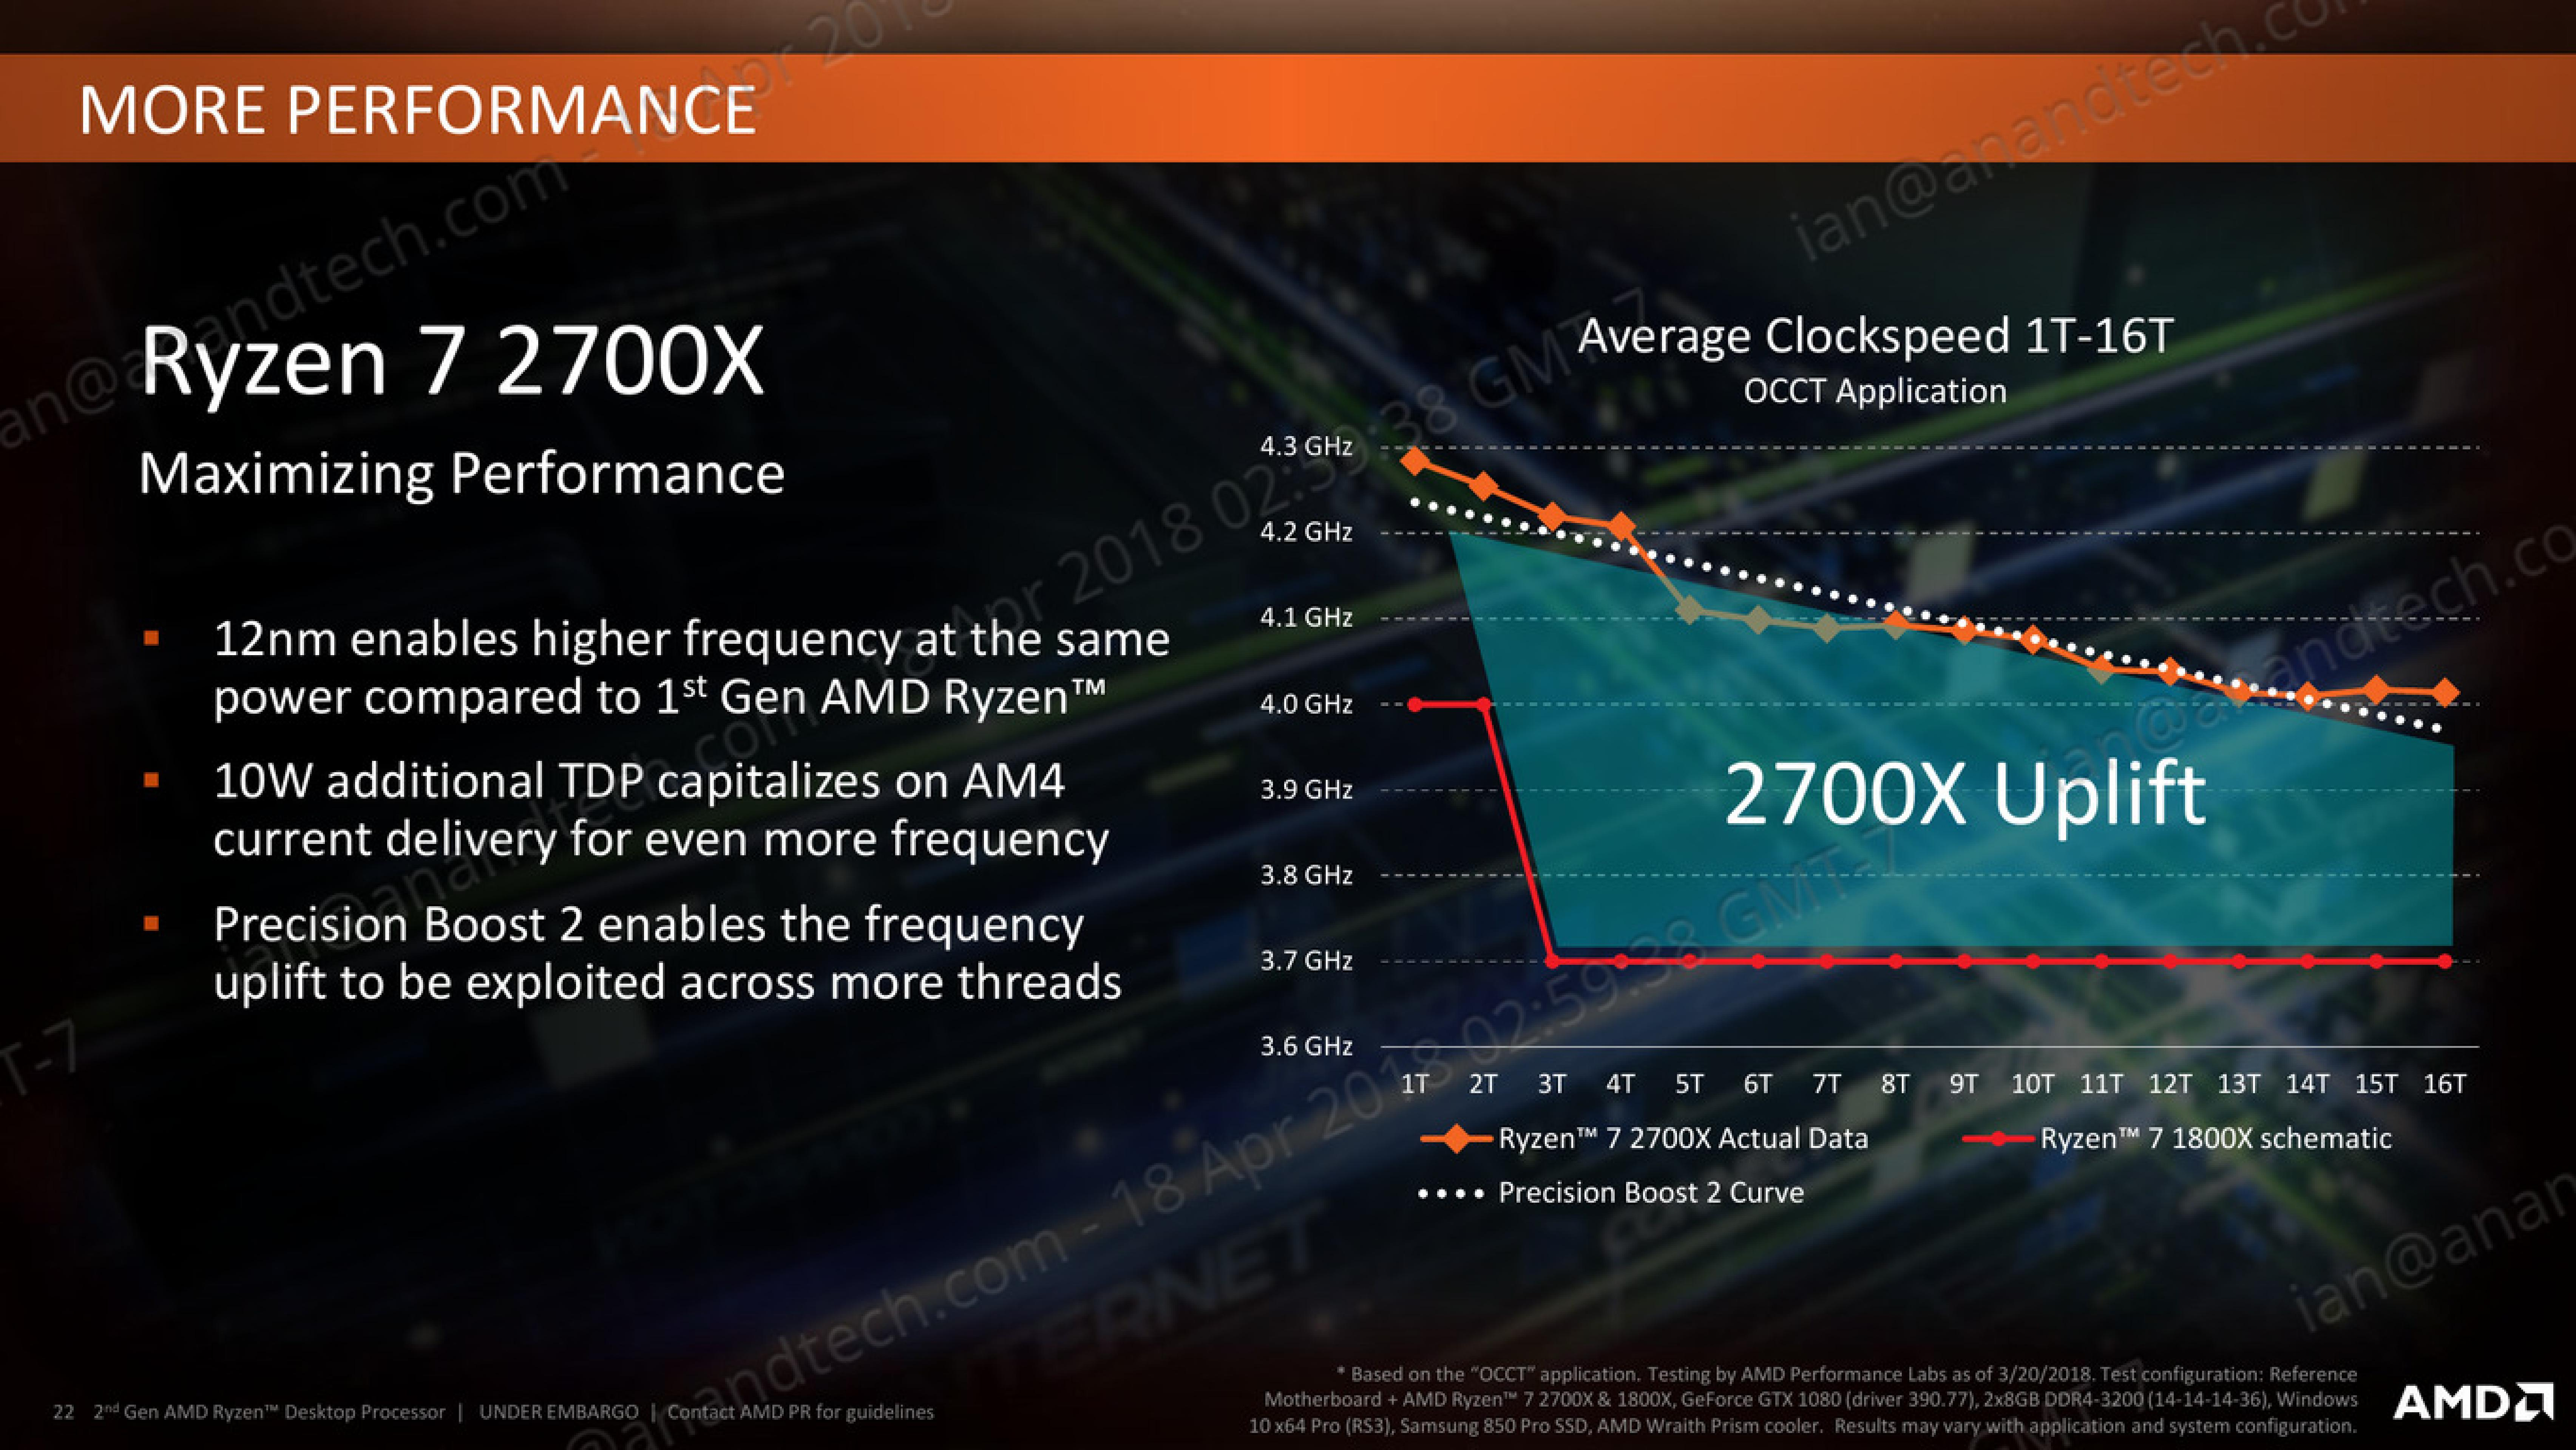 What Is New: Zen+ Updates - The AMD Threadripper 2 Teaser